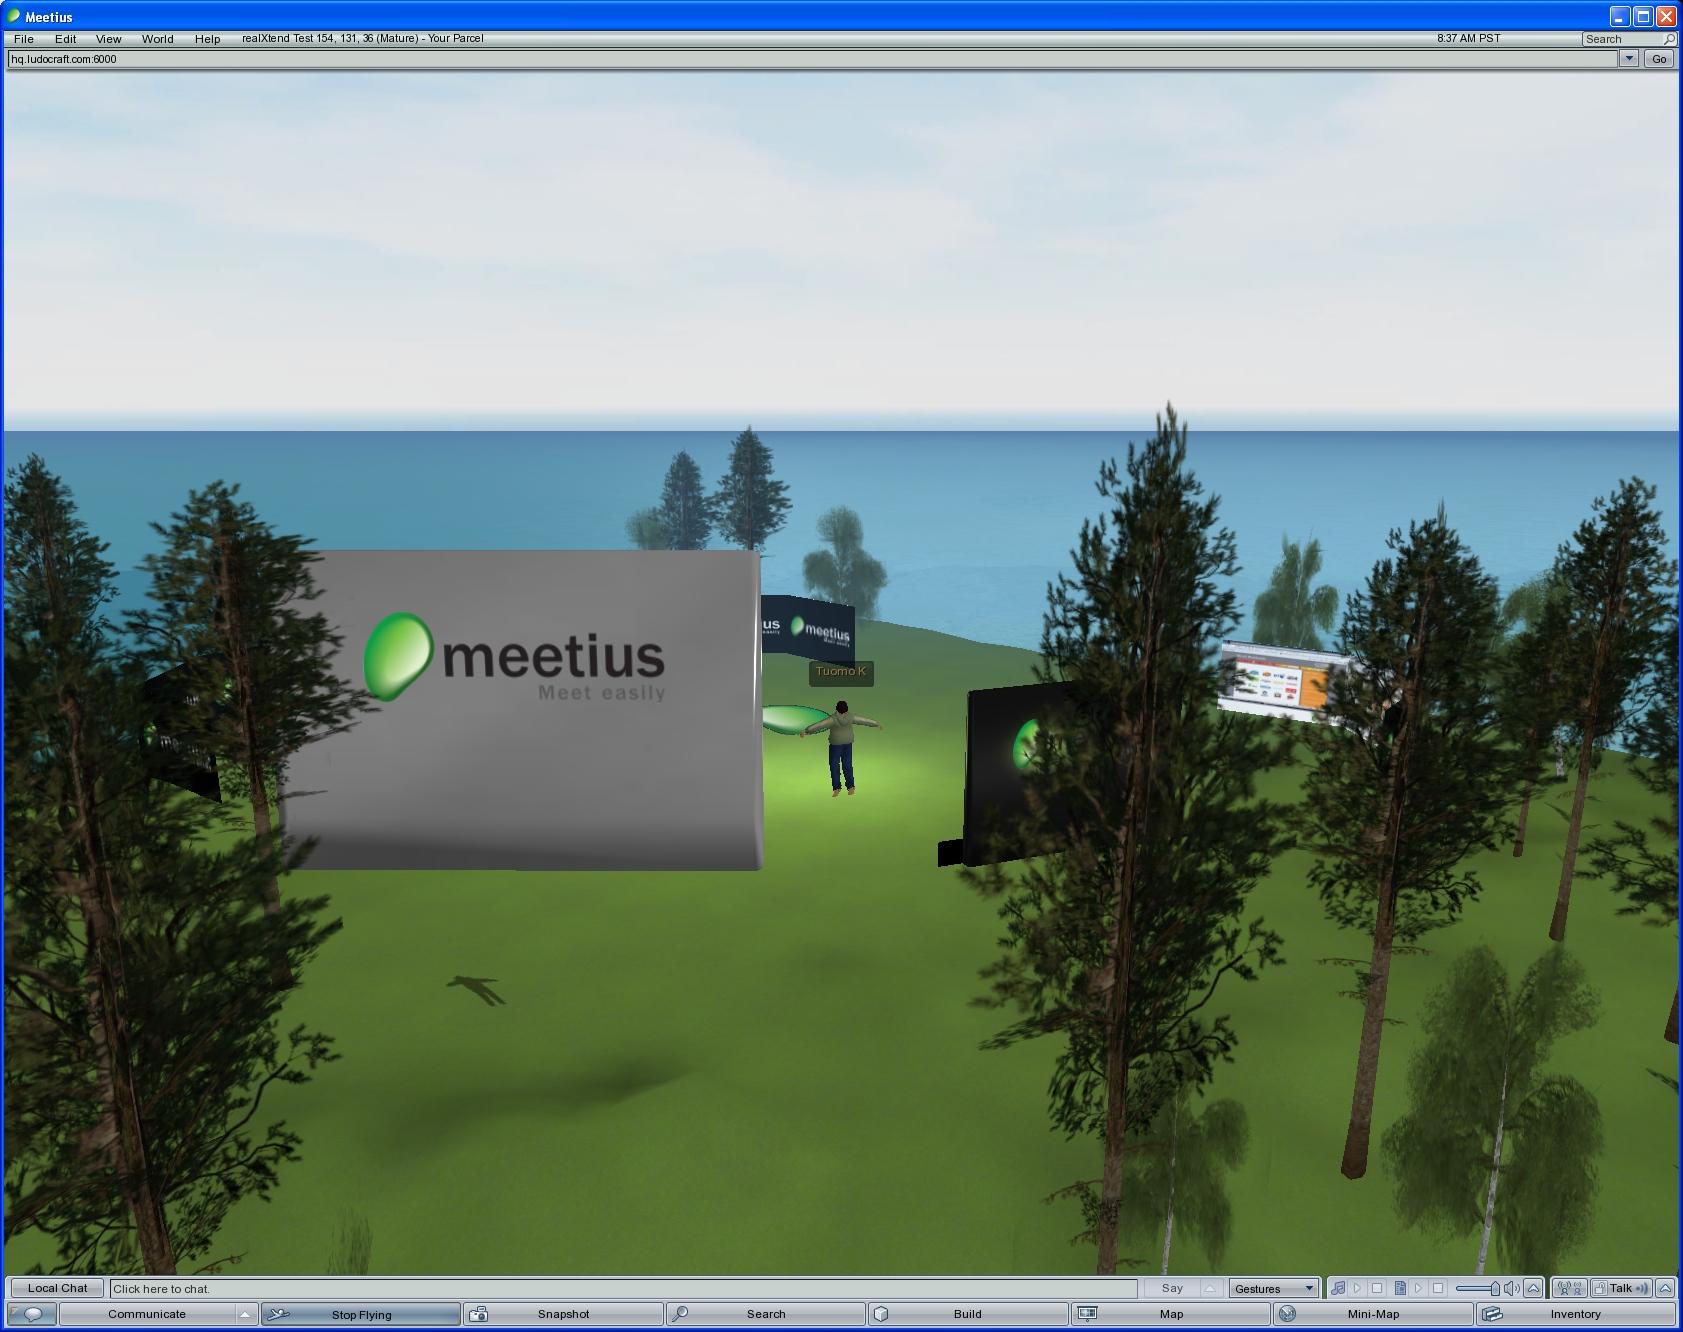 meetius_screenshot_04